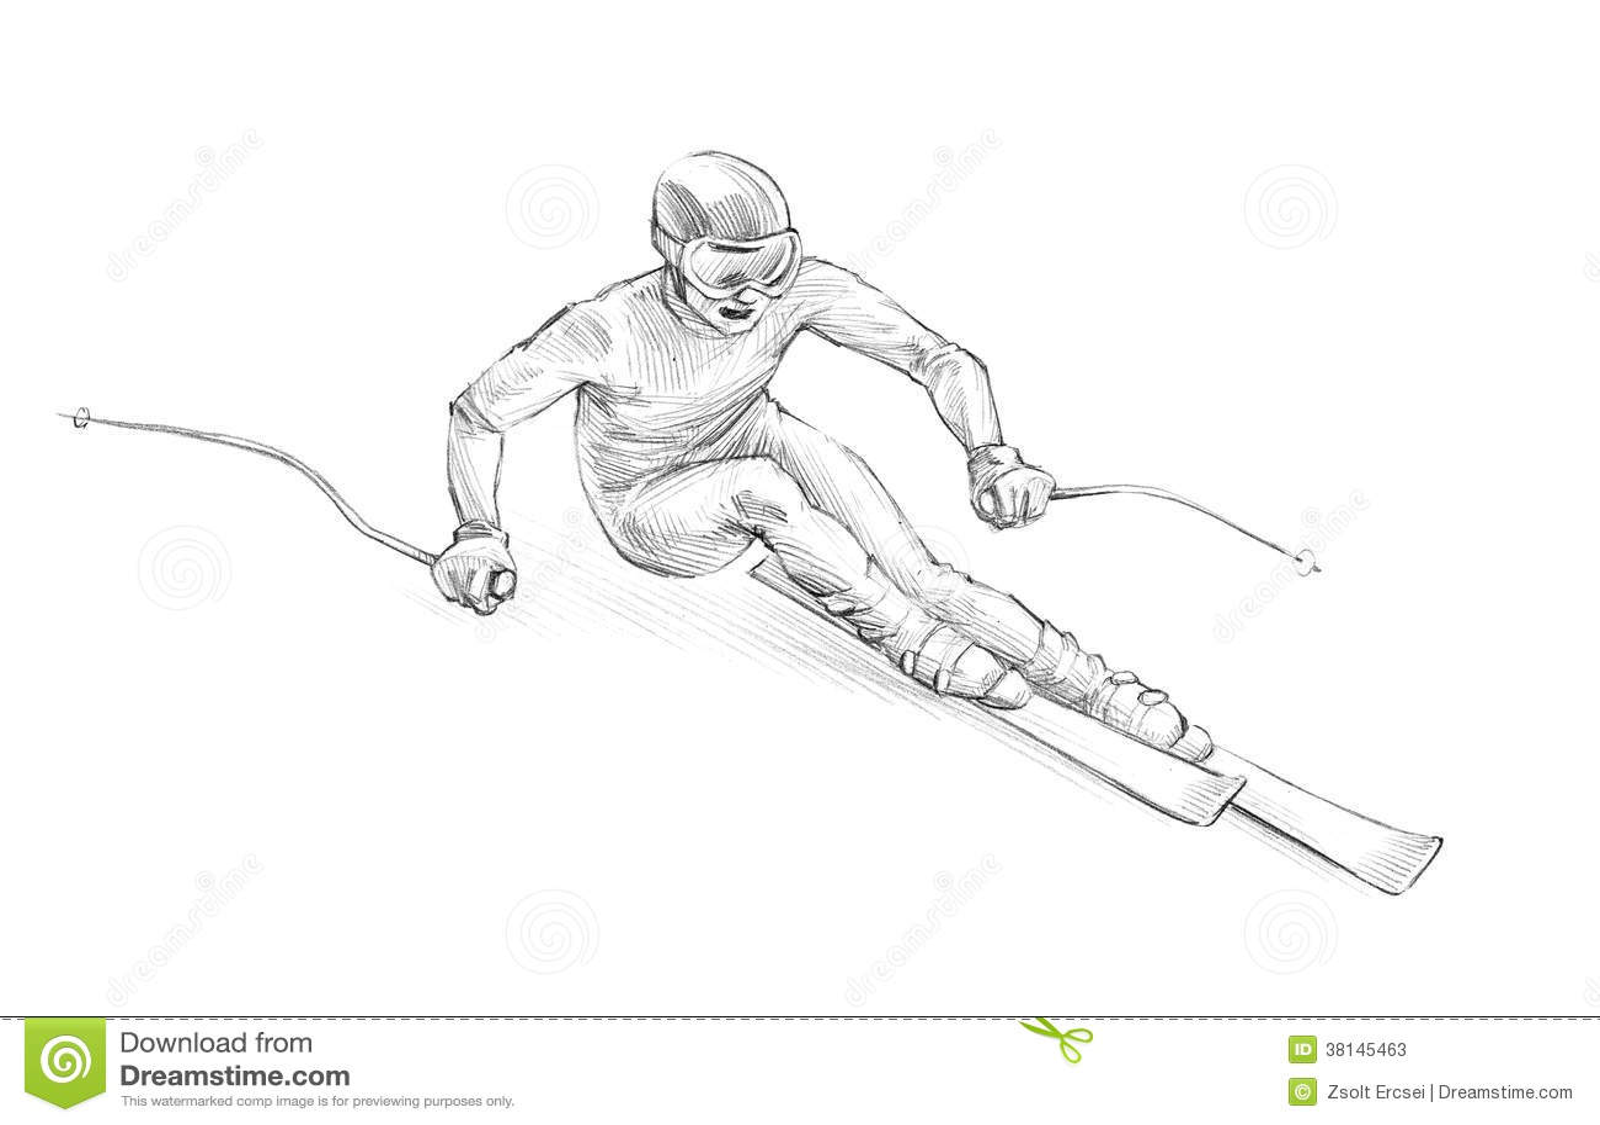 Hand Drawn Sketch Pencil Illustration Of An Alpine Skier